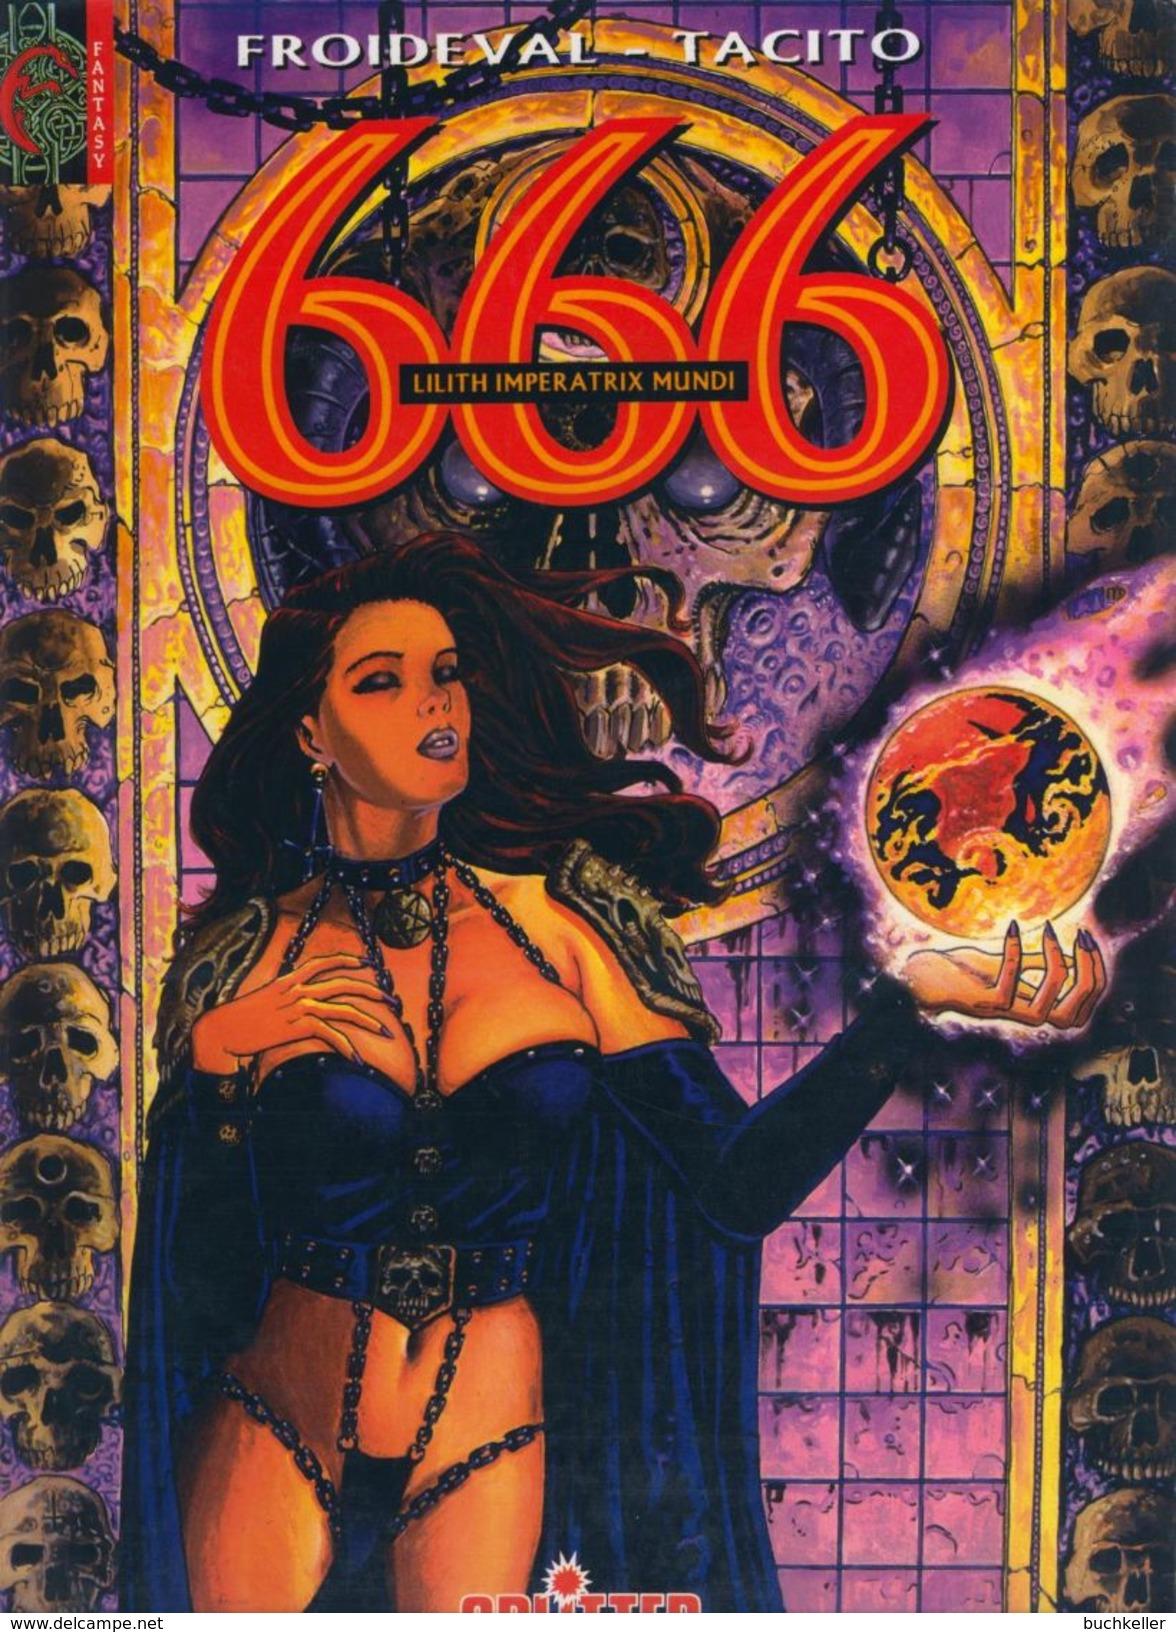 666 Nr. 4: Lilith Imperatrix Mundi - Splitter - Comic Erstausgabe Froideval/ Tacito - Livres, BD, Revues